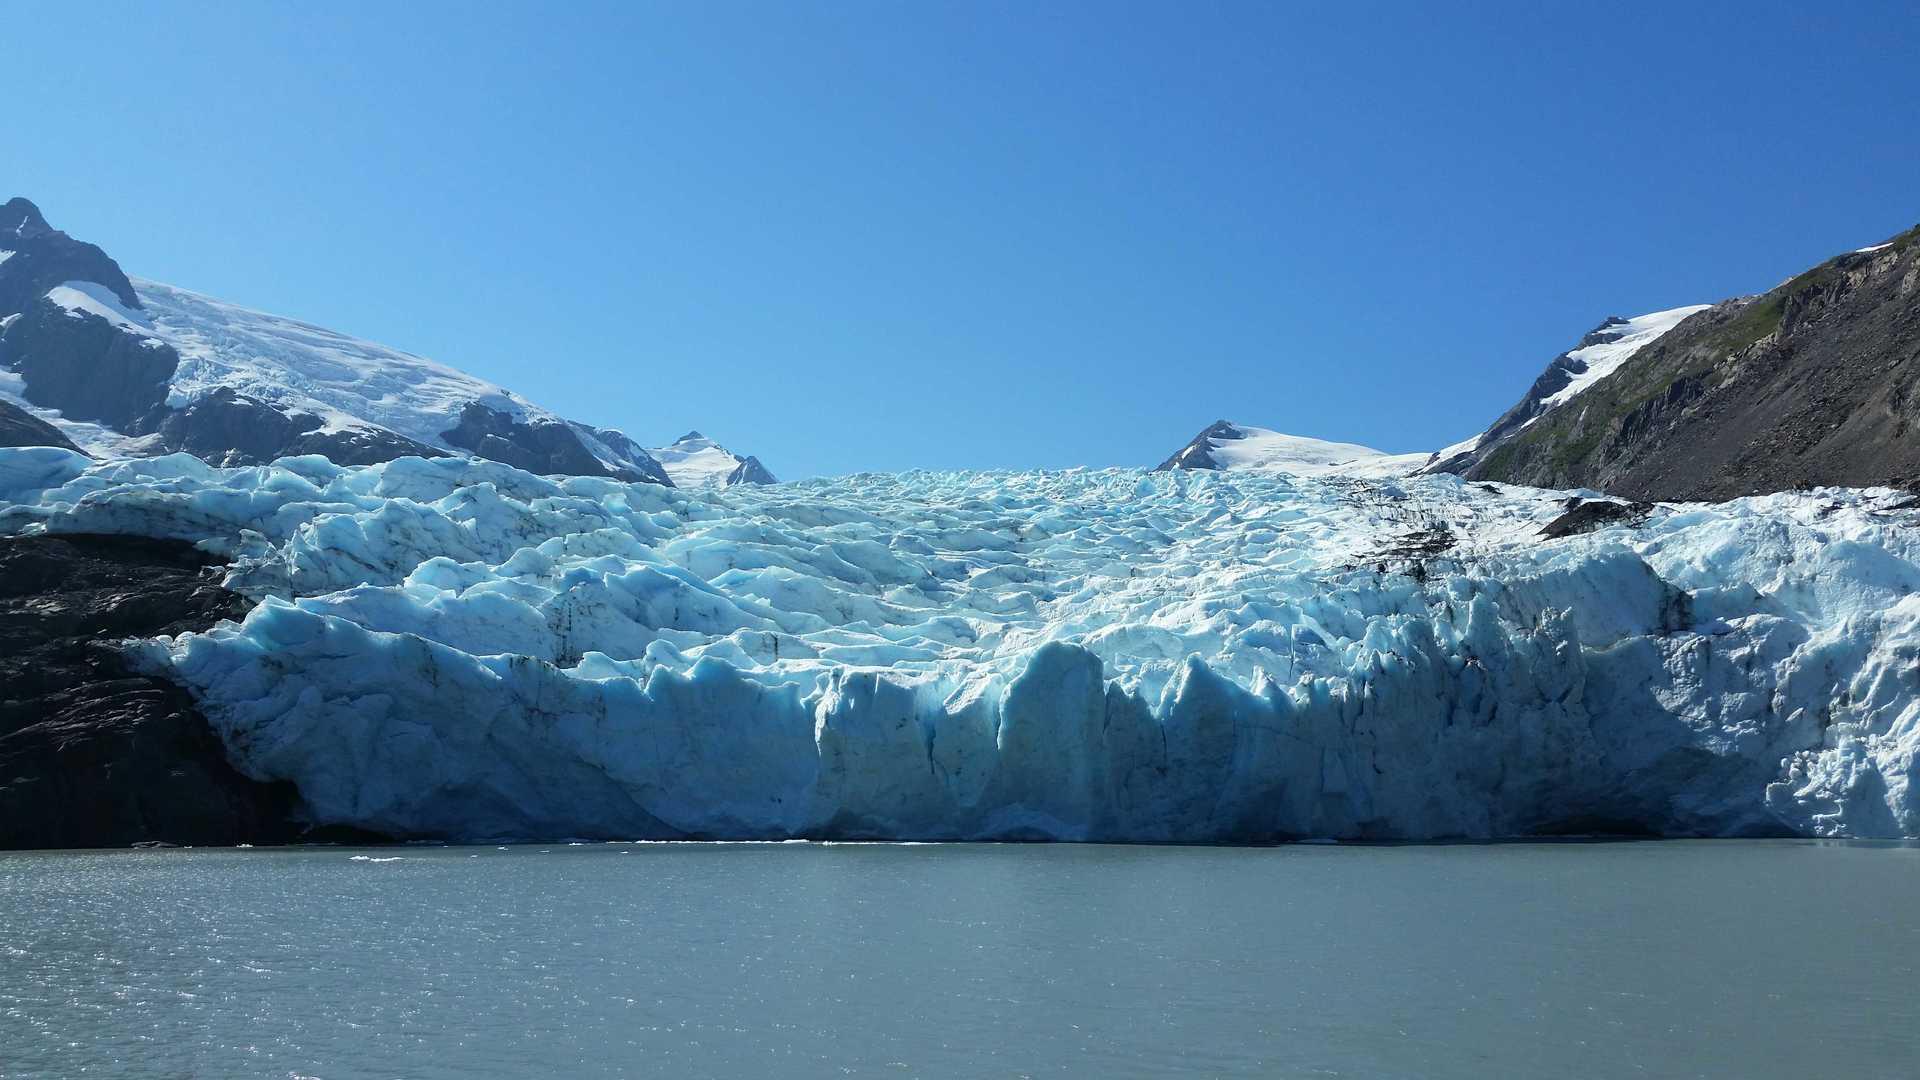 Taken Aug. 2015 | elise81, arctic, ice, iceberg